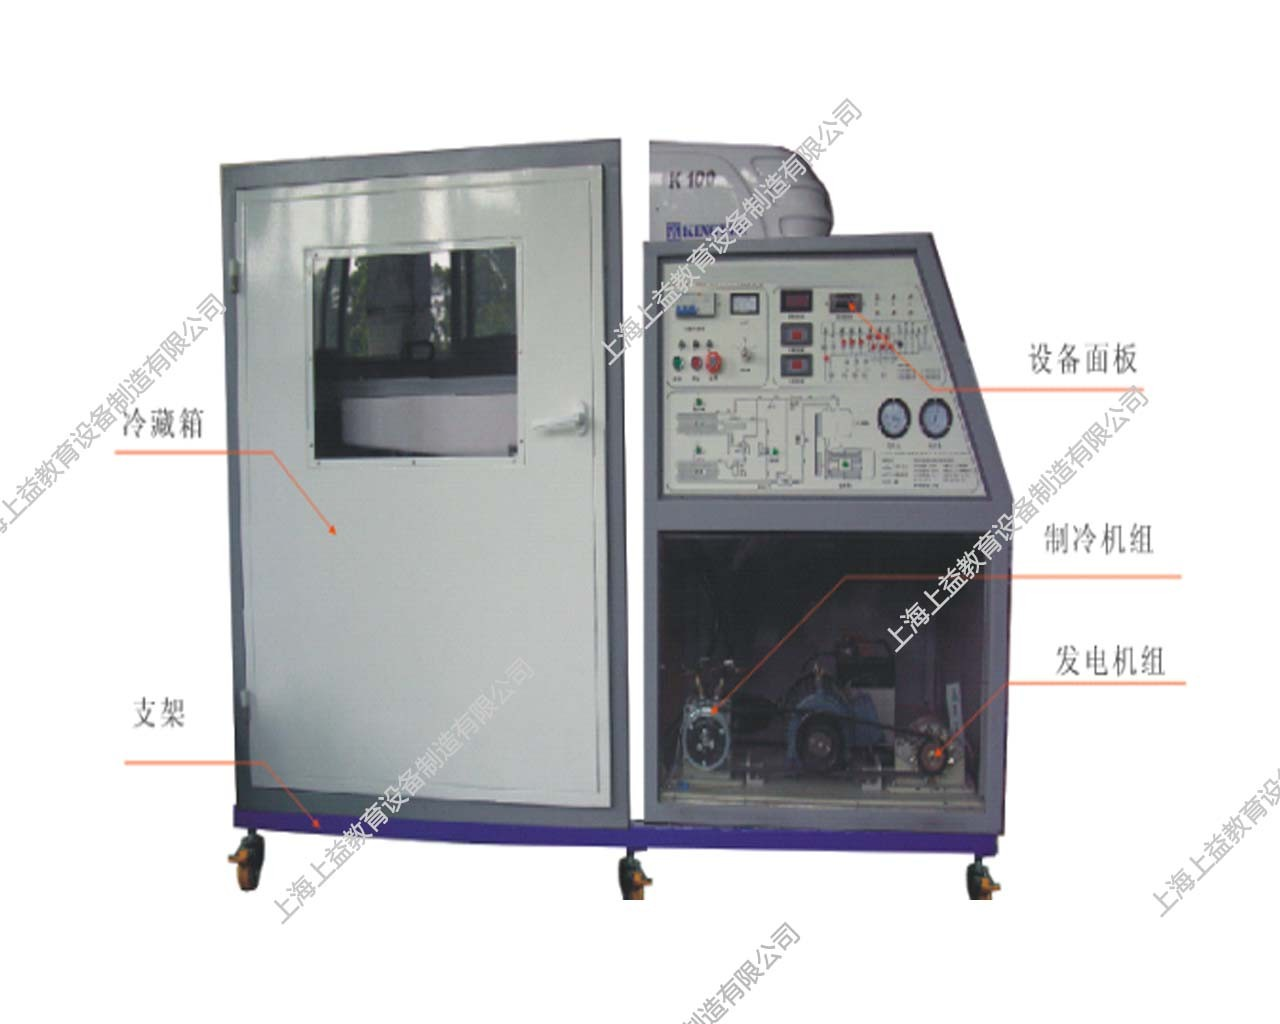 SYJD-08G型 冷藏车制冷系统wwwlehu8vip装置